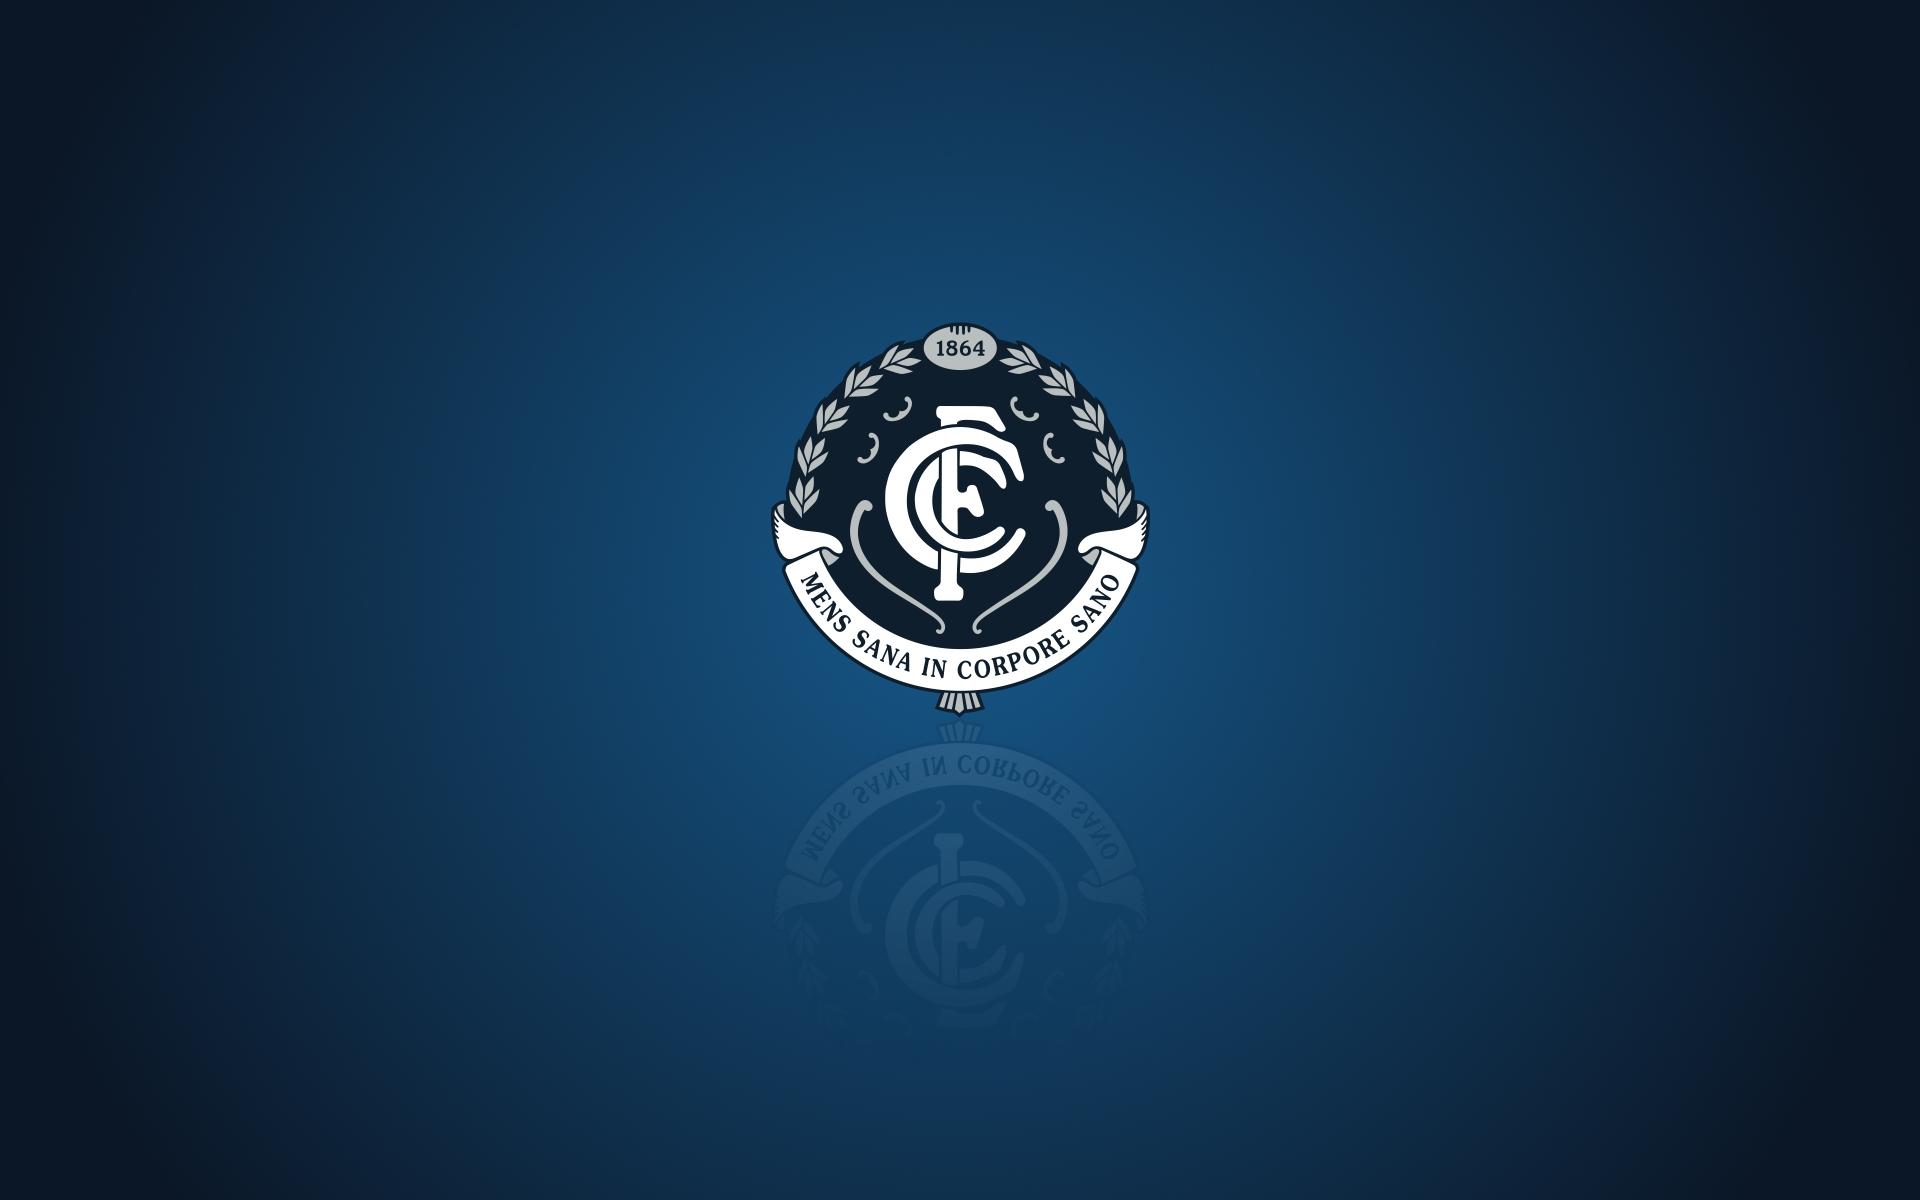 Carlton Blues Wallpaper Widescreen Desktop Background With Team Logo